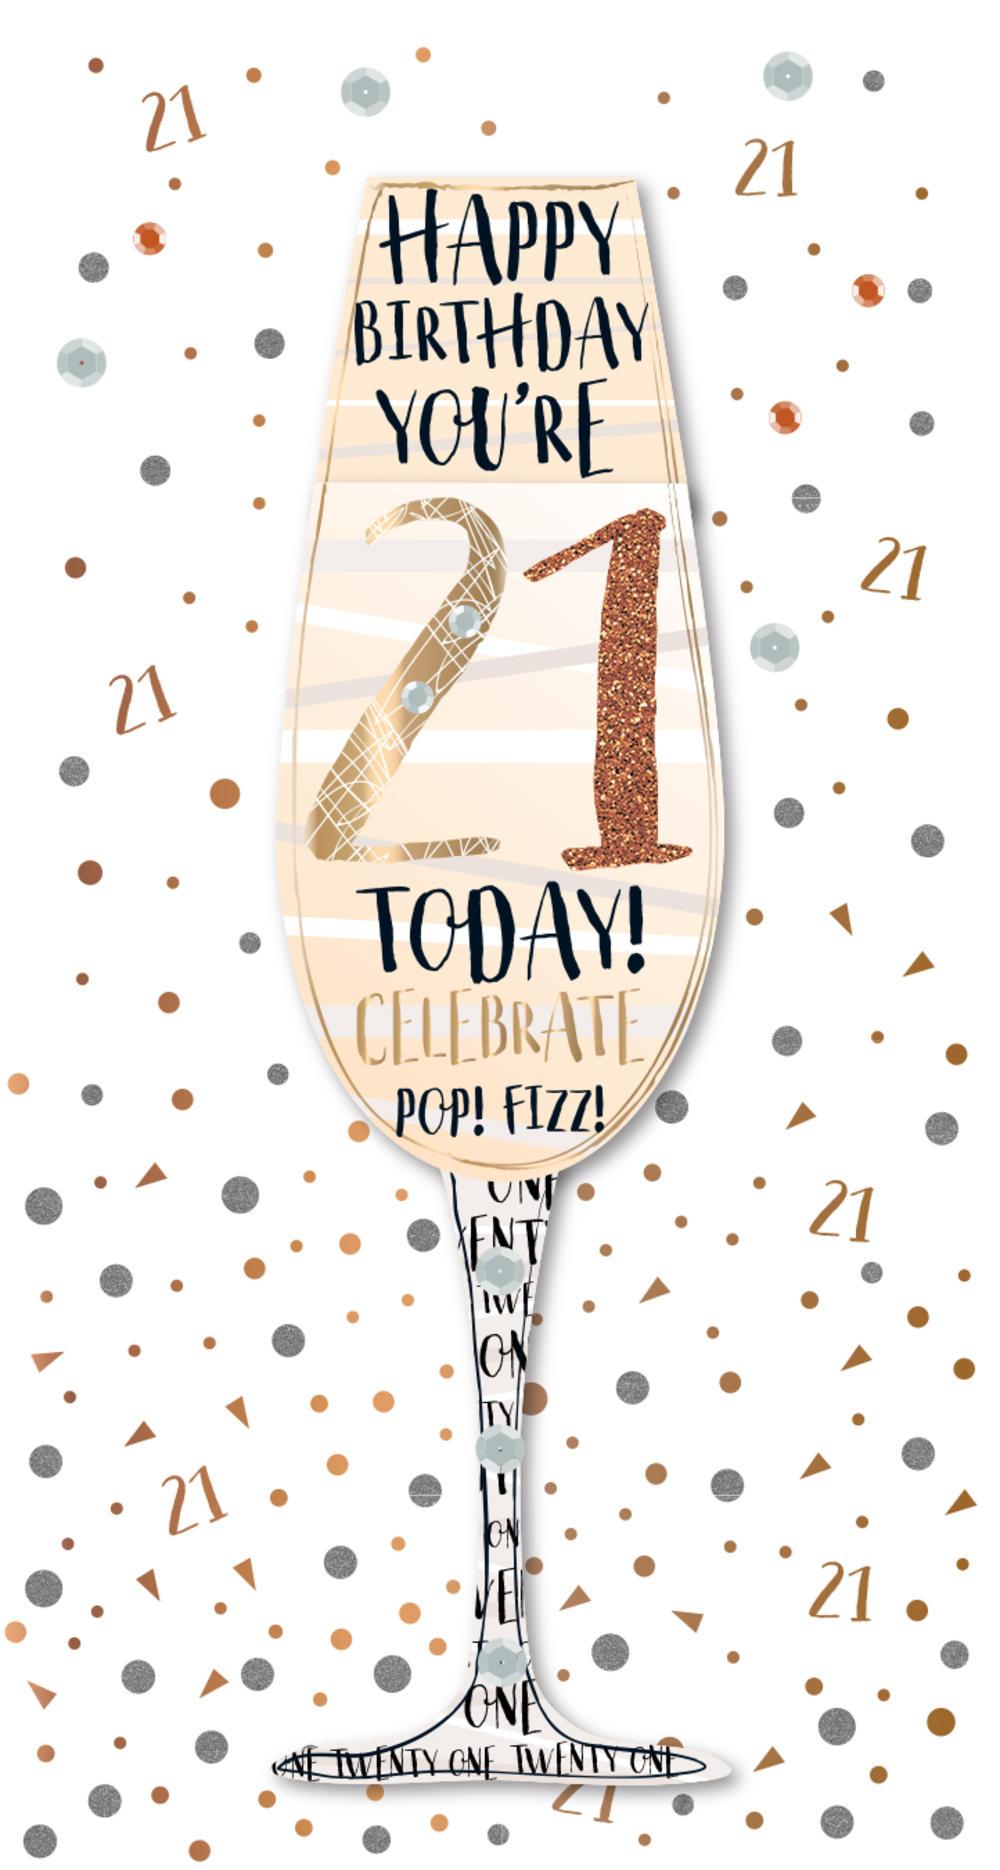 Happy 21st Birthday Images.Happy 21st Birthday Handmade Embellished Greeting Card